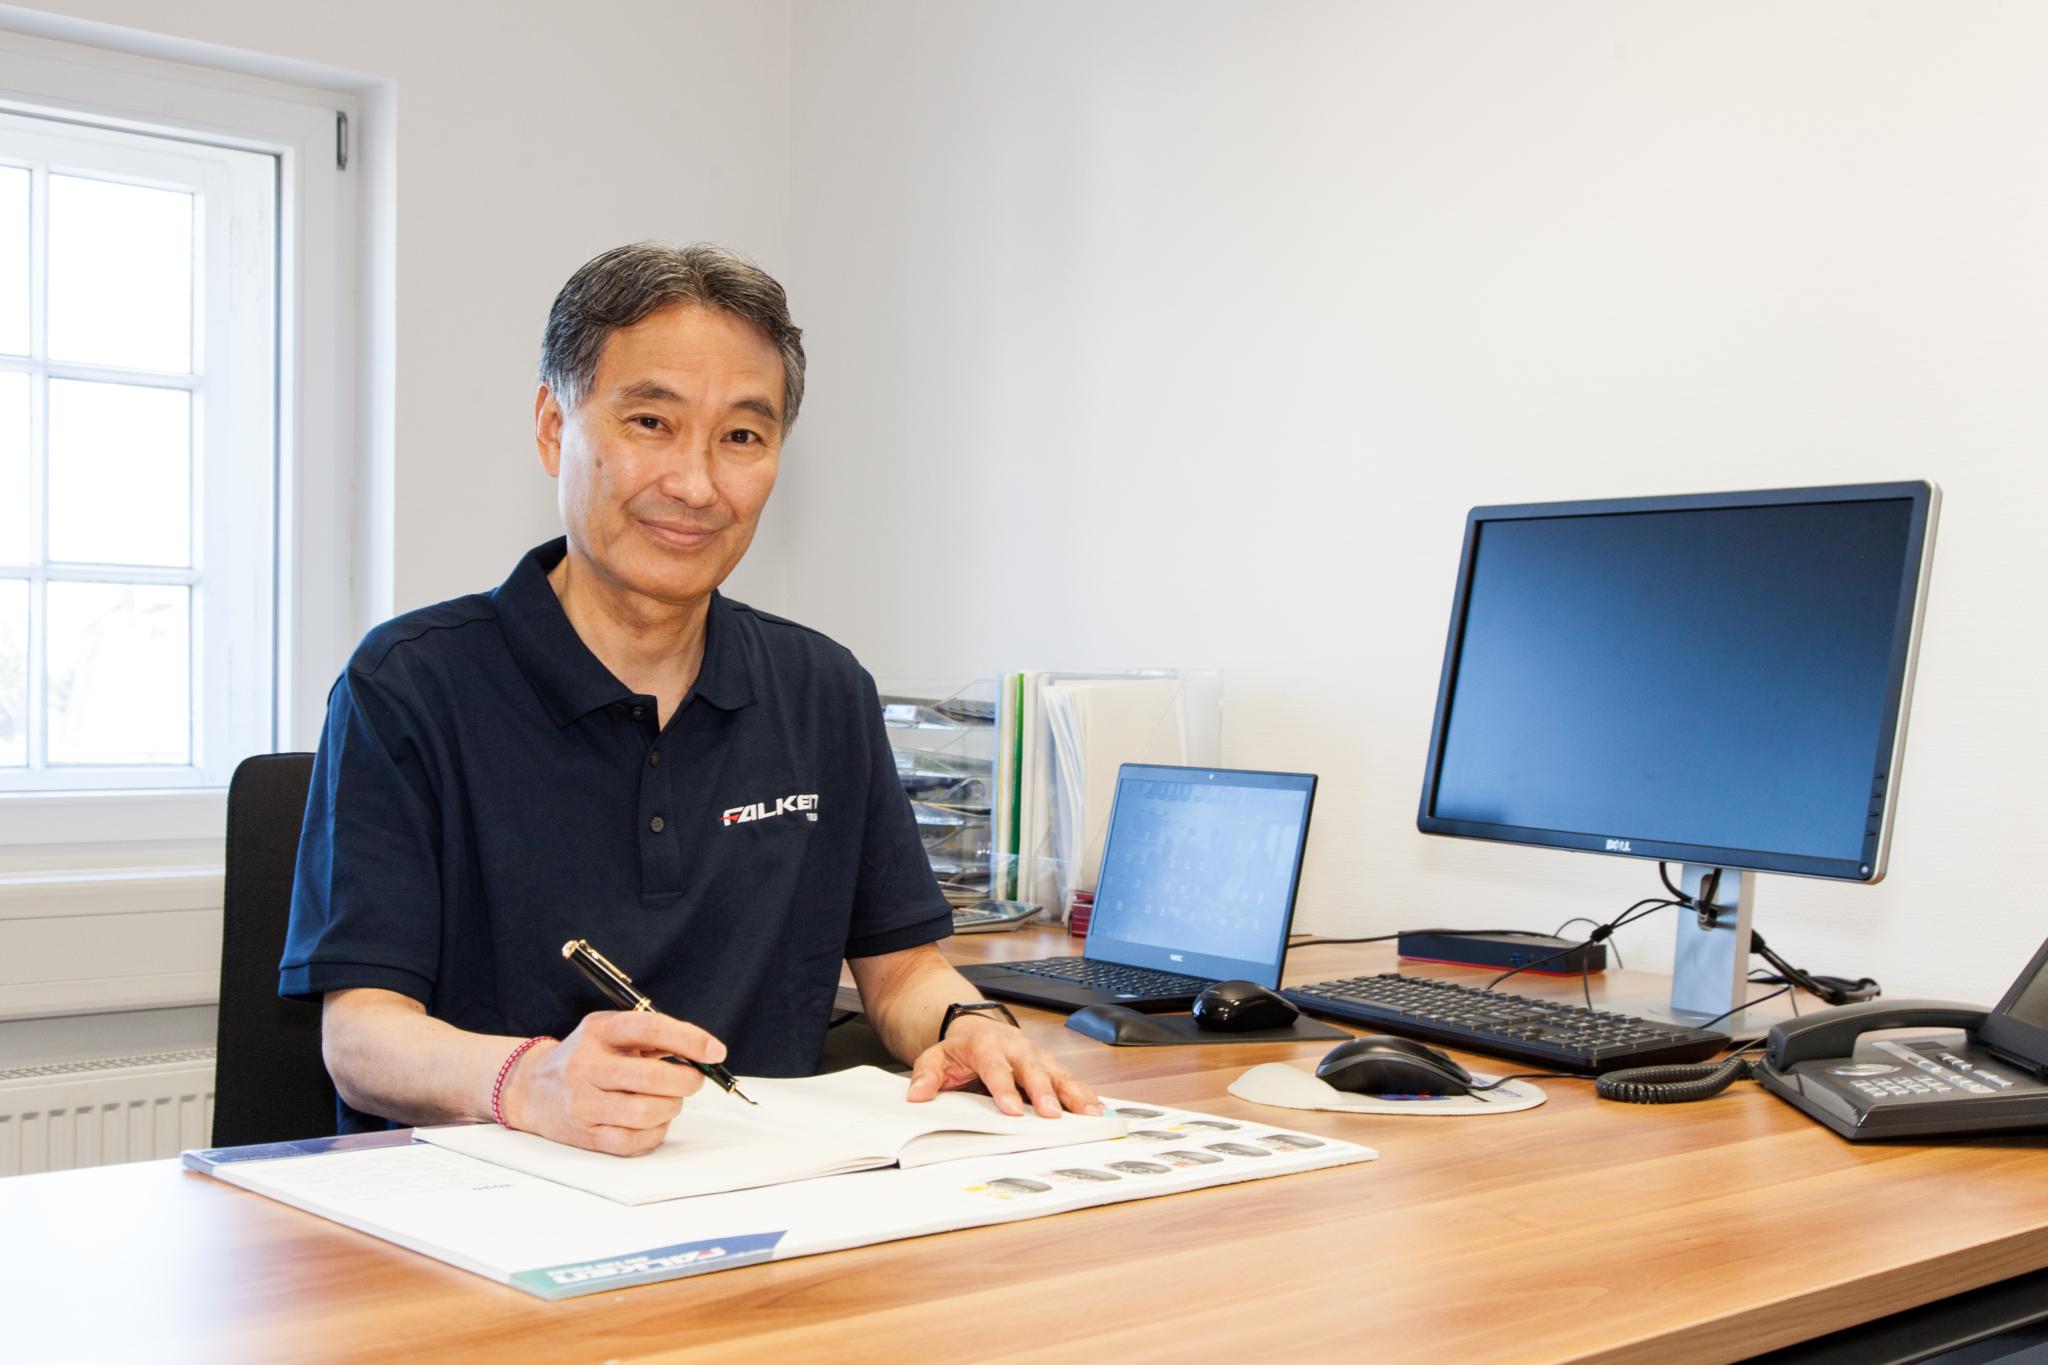 Tomohiko Masuta appointed managing director of Falken, Sumitomo Rubber Europe